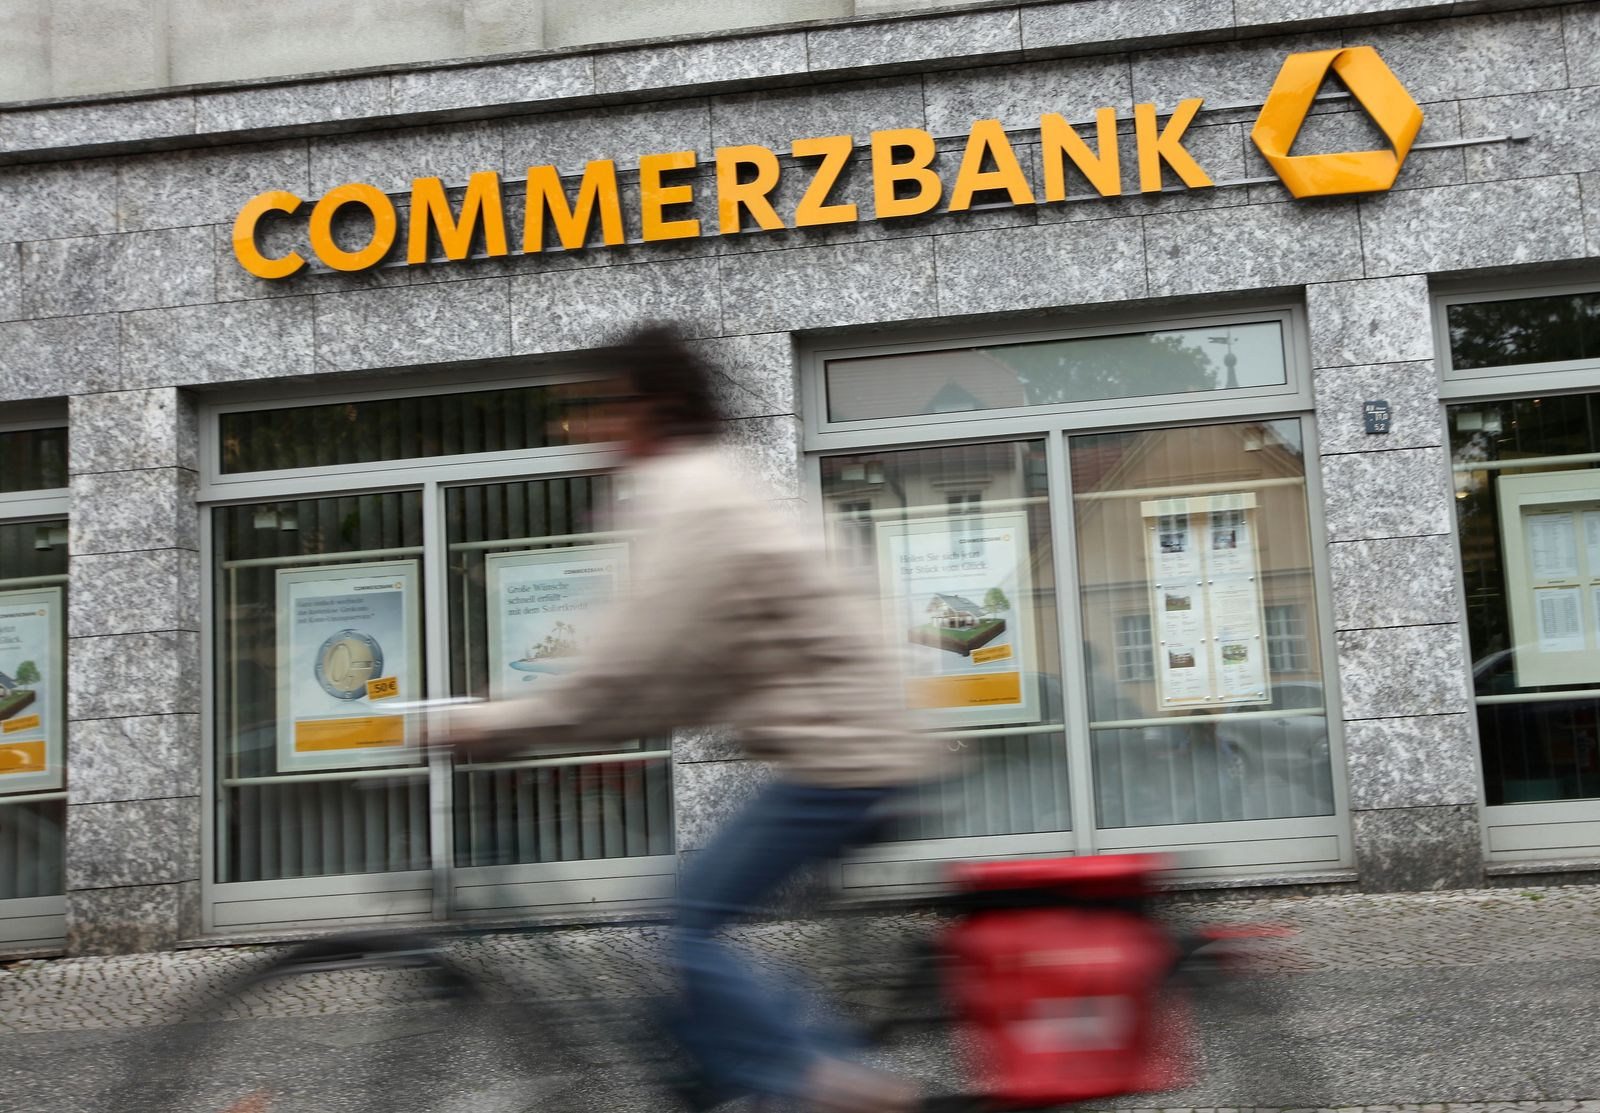 Commerzbank /Filiale / Schaufenster